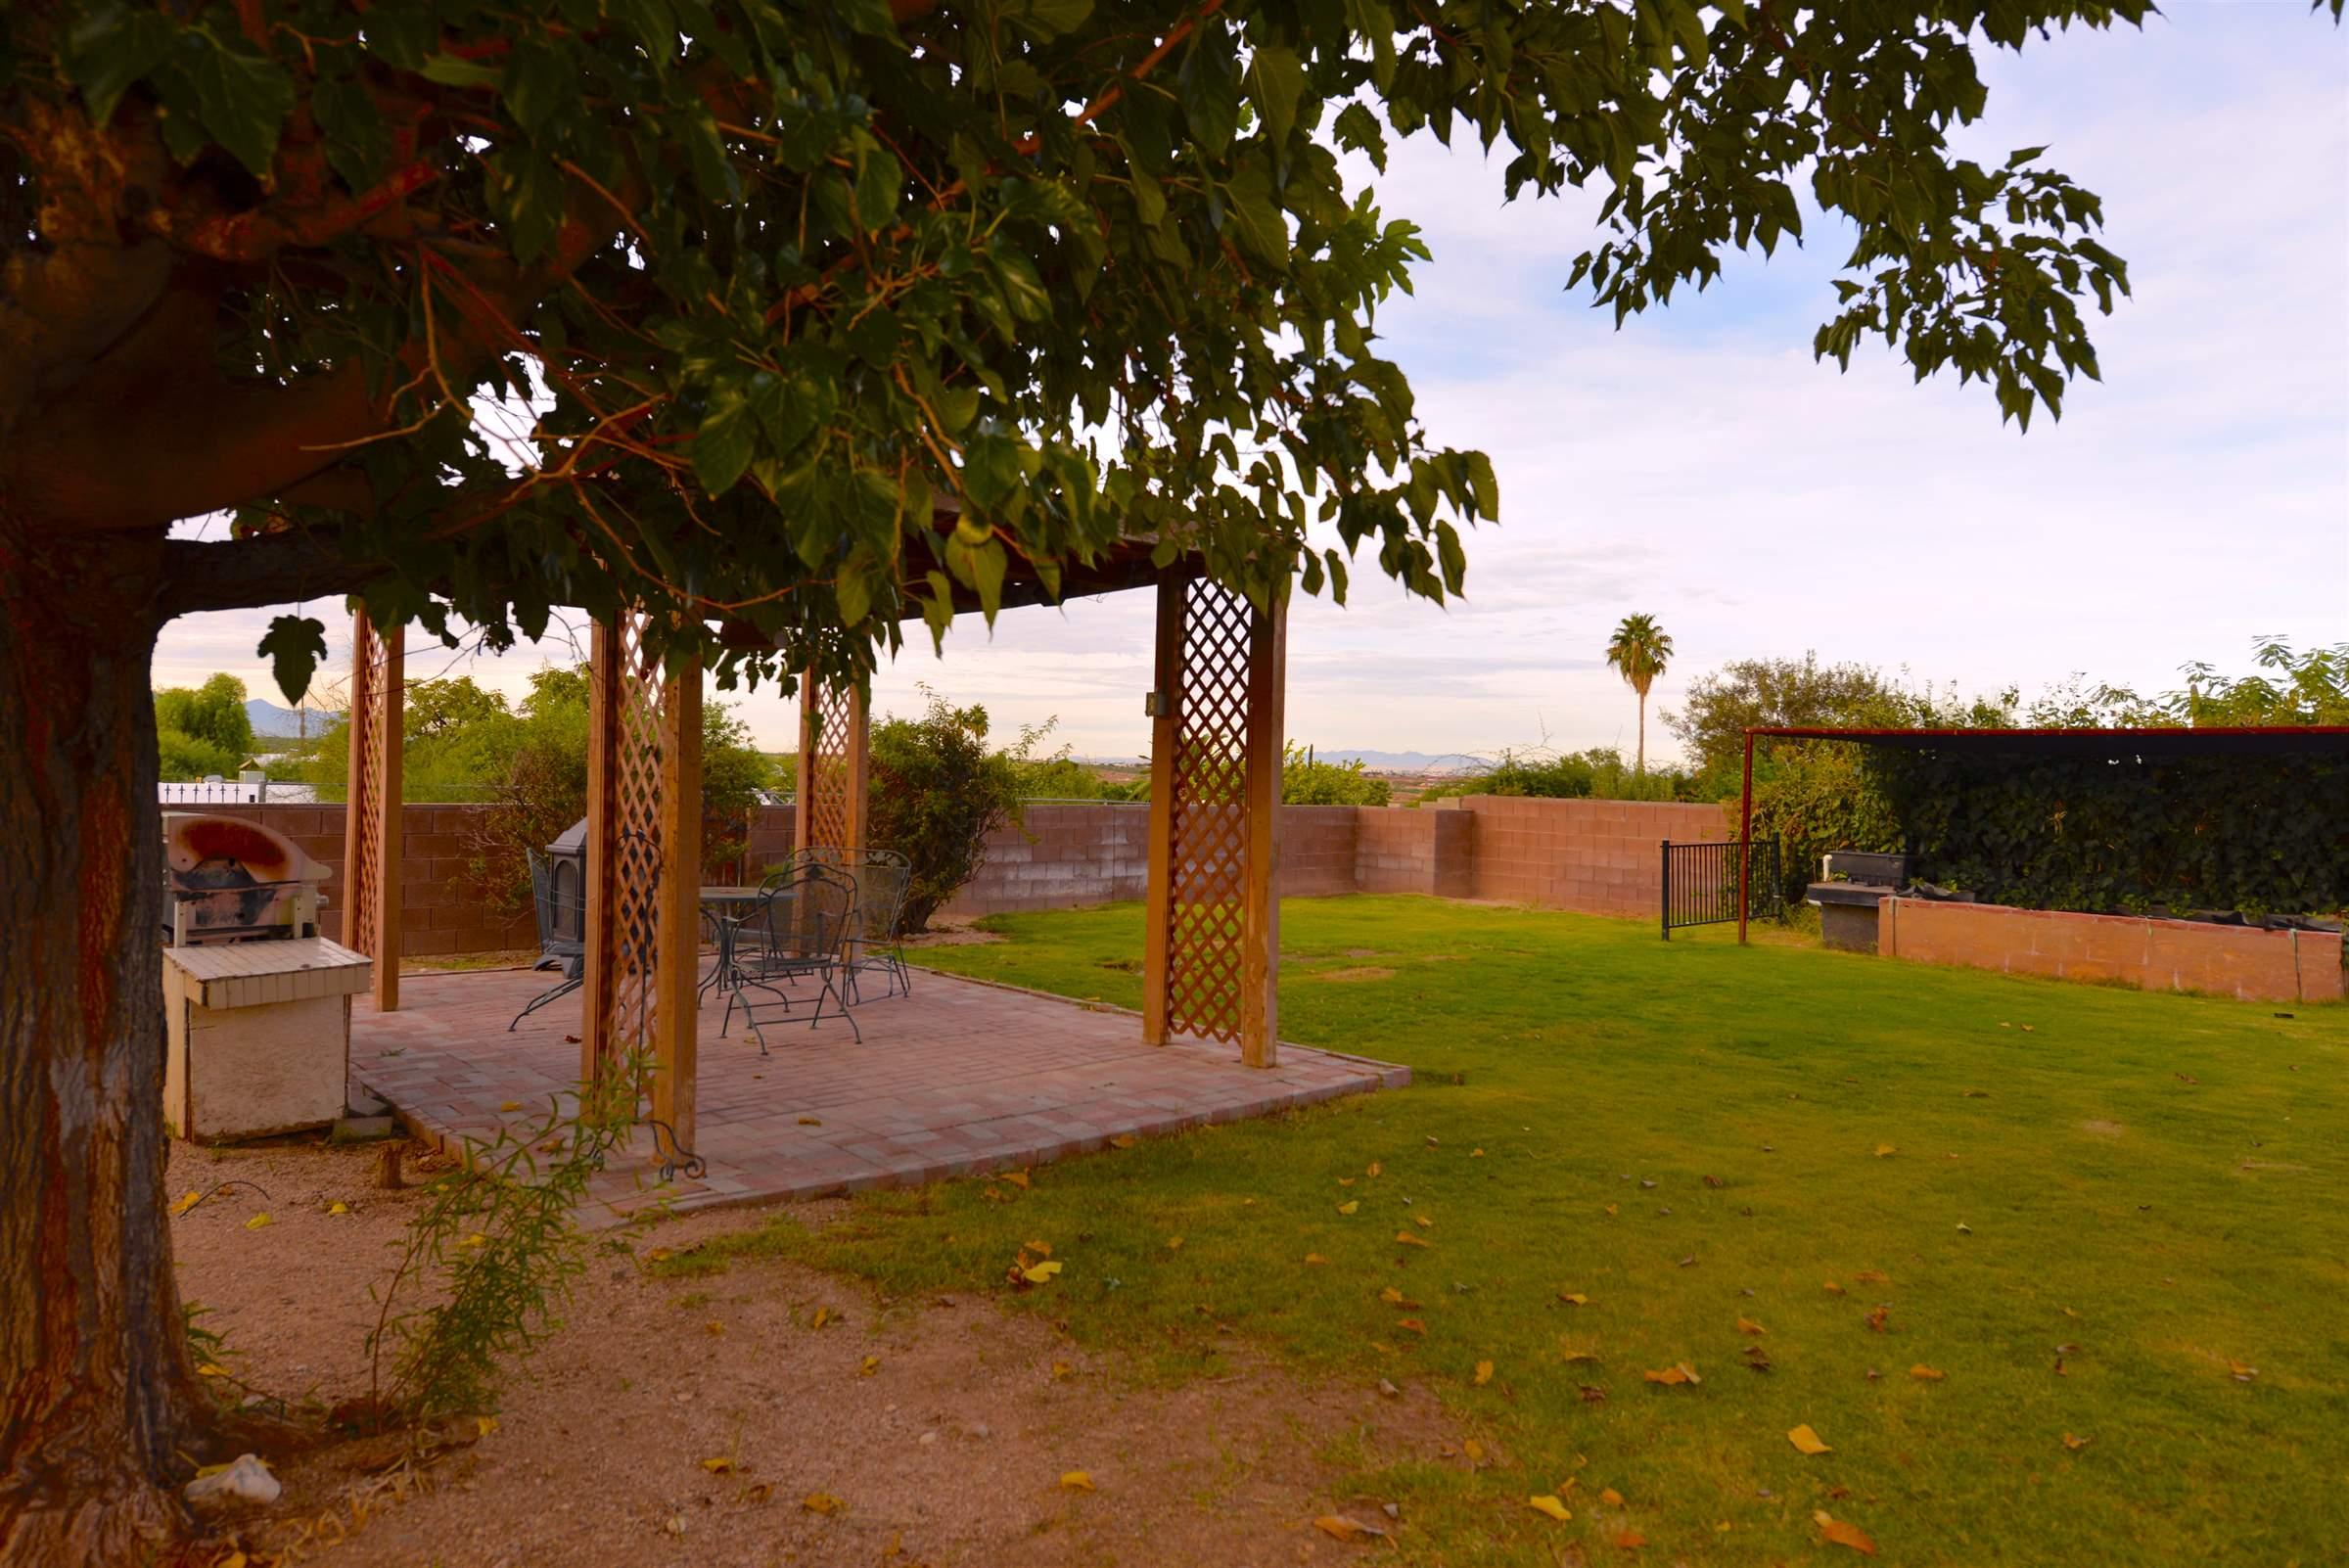 9830 E Celeste Dr, Tucson, AZ 85730